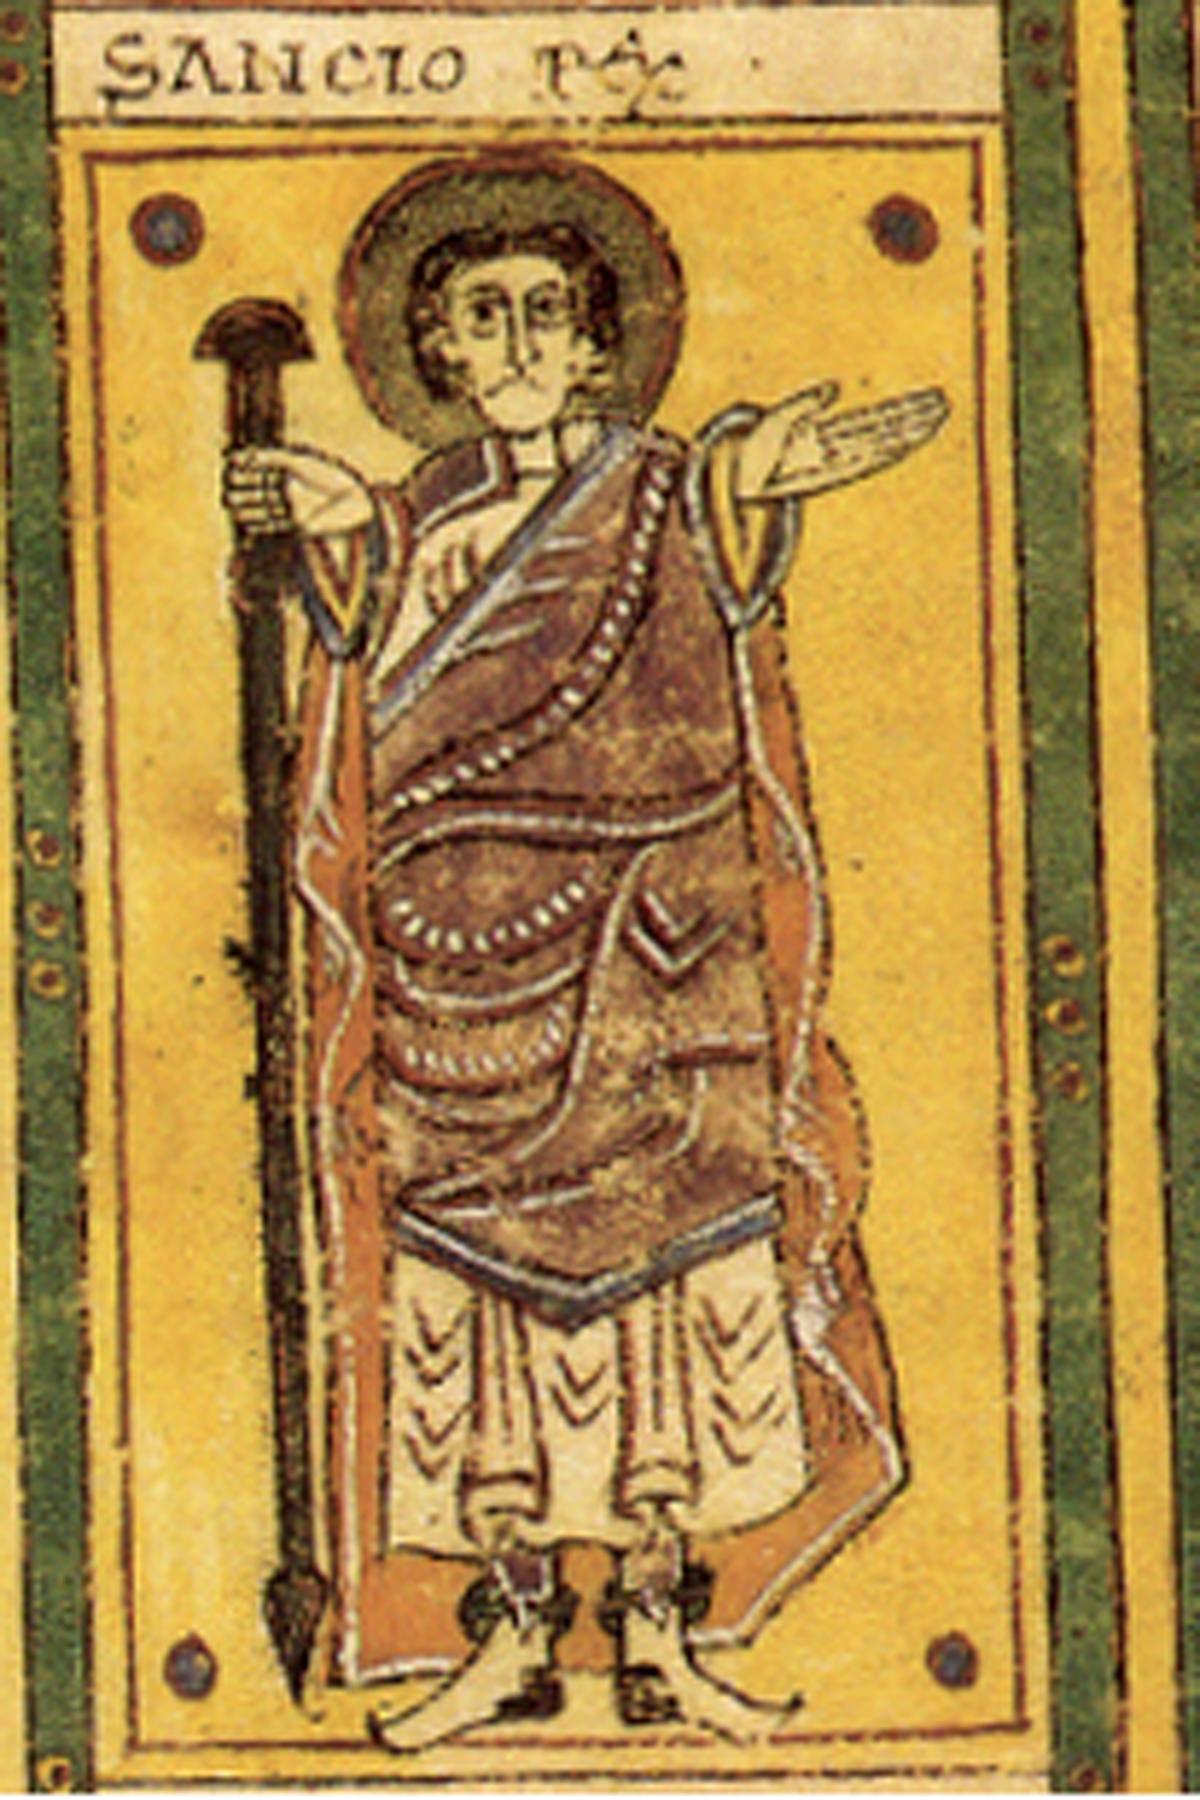 Wikipedia--Rey de Pamplona-Nájera.